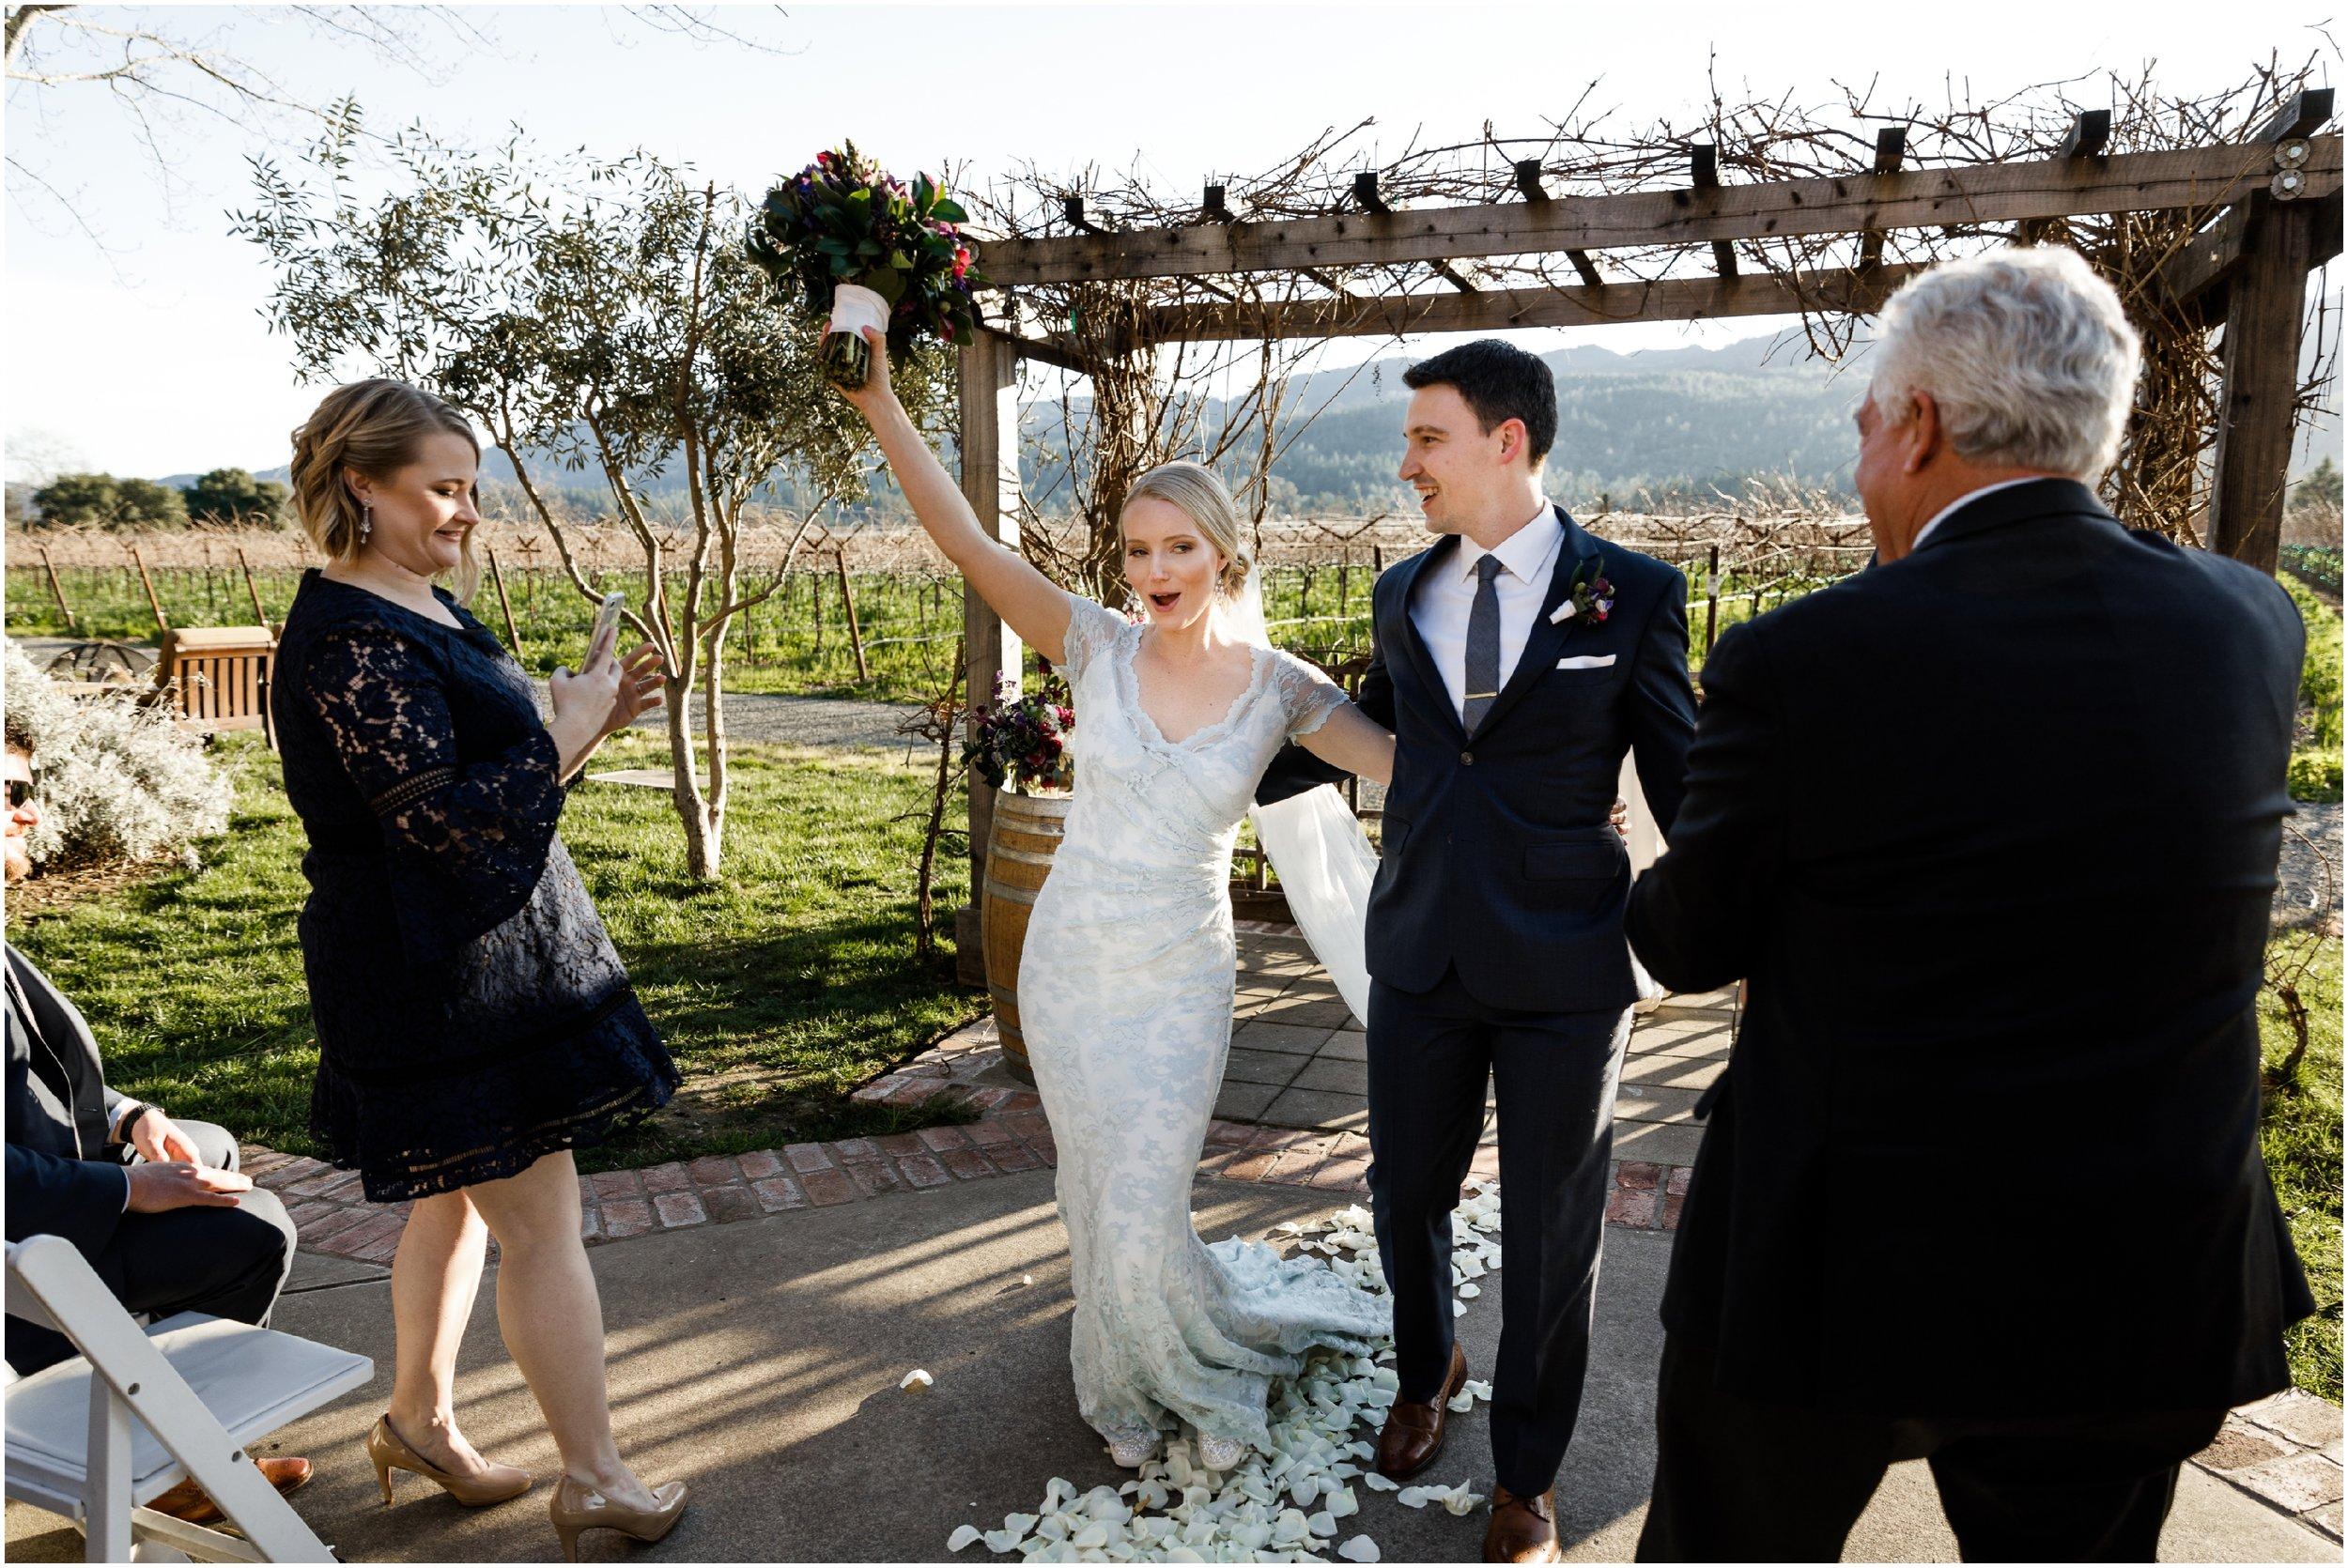 bride raising bouquet during wedding recessional